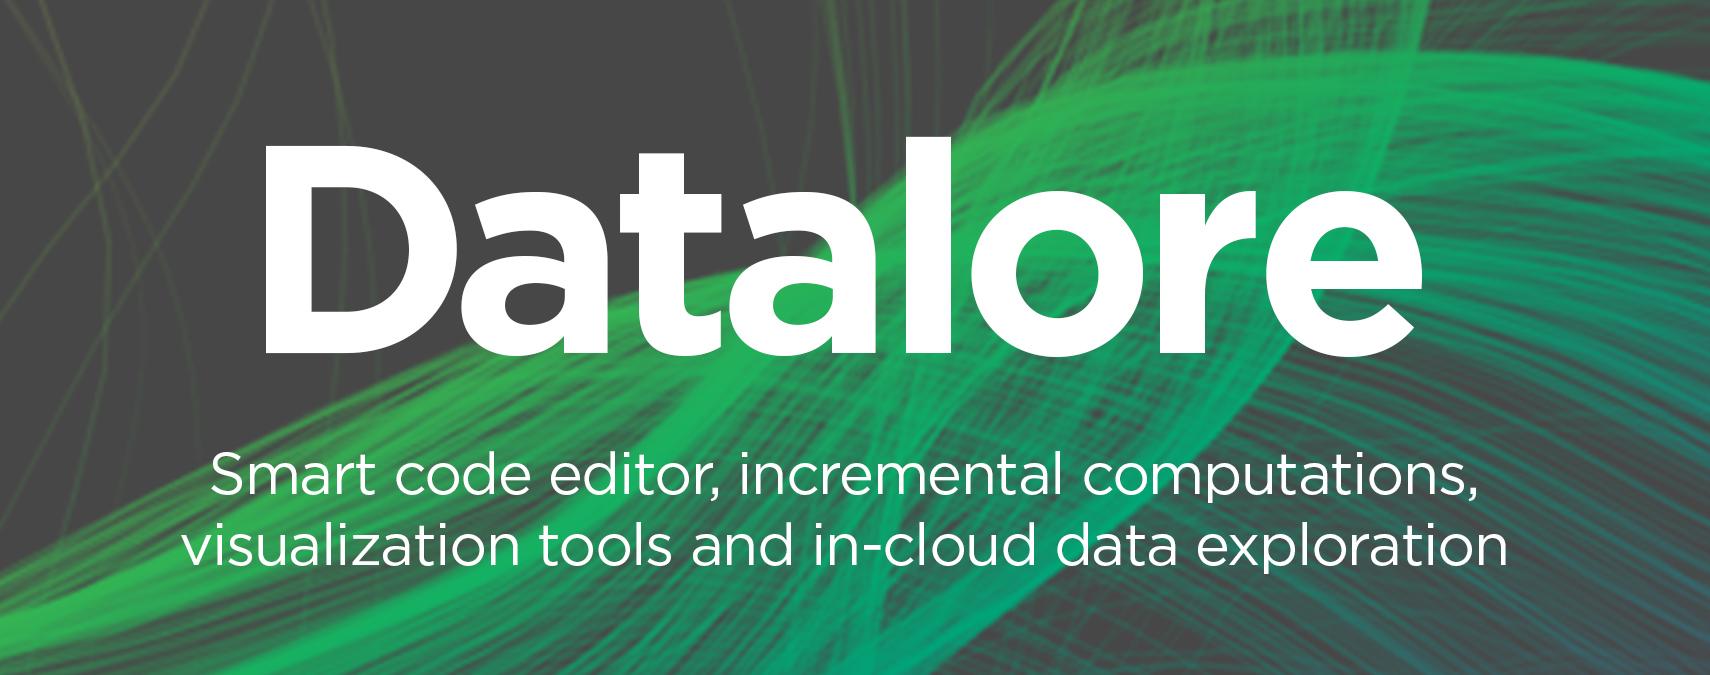 Datalore 1.0